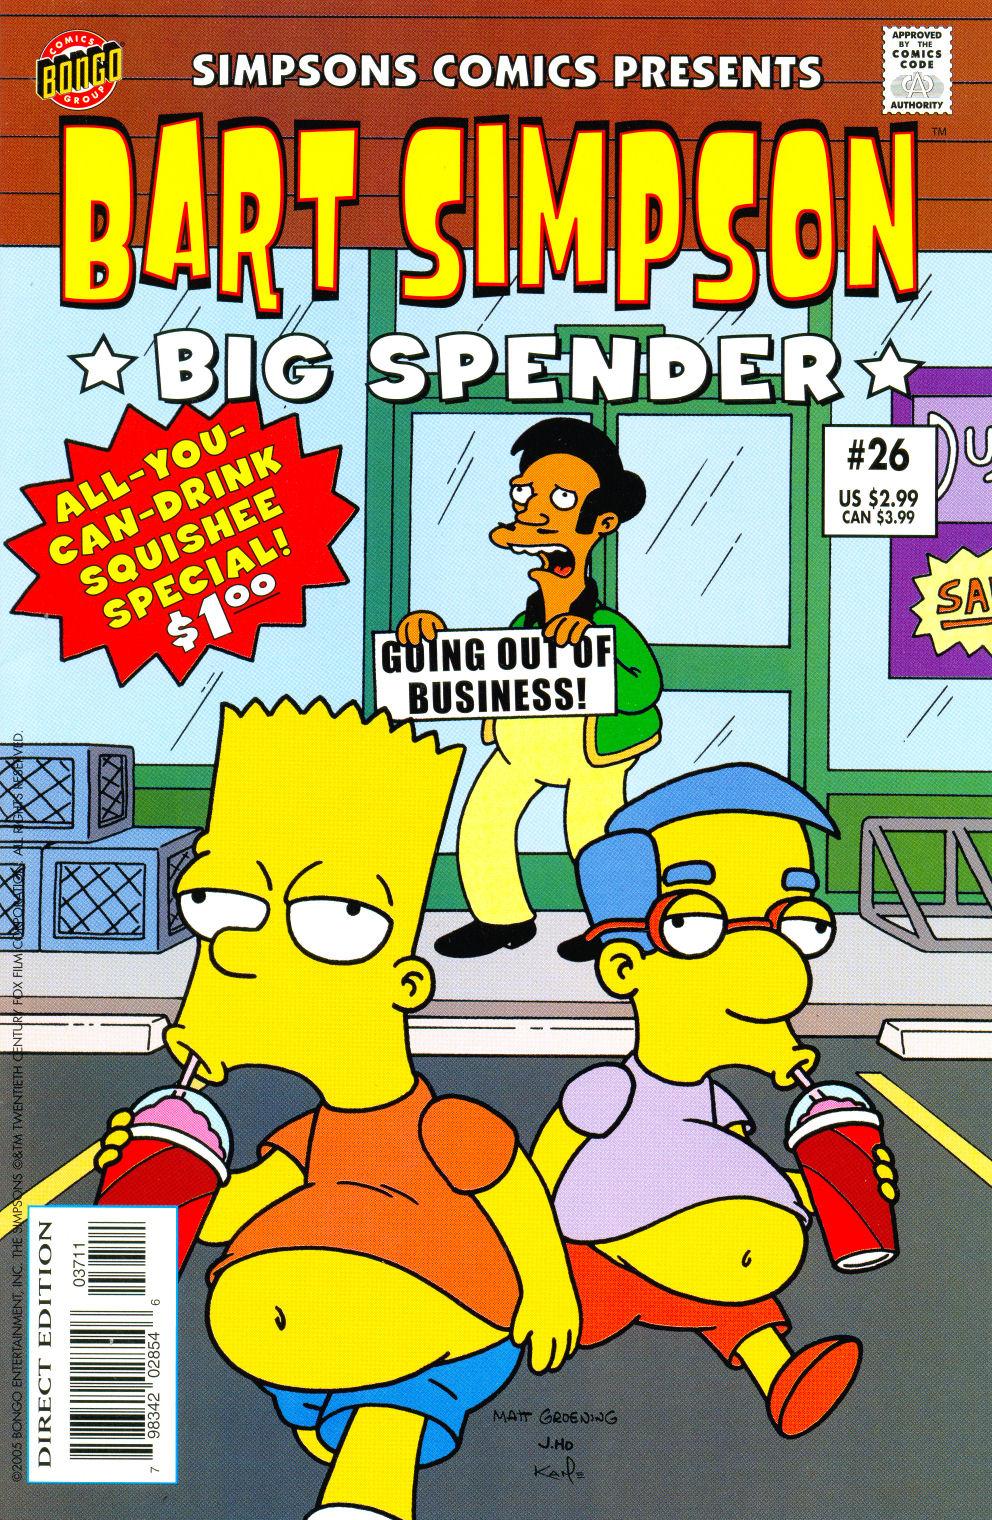 Read online Simpsons Comics Presents Bart Simpson comic -  Issue #26 - 1